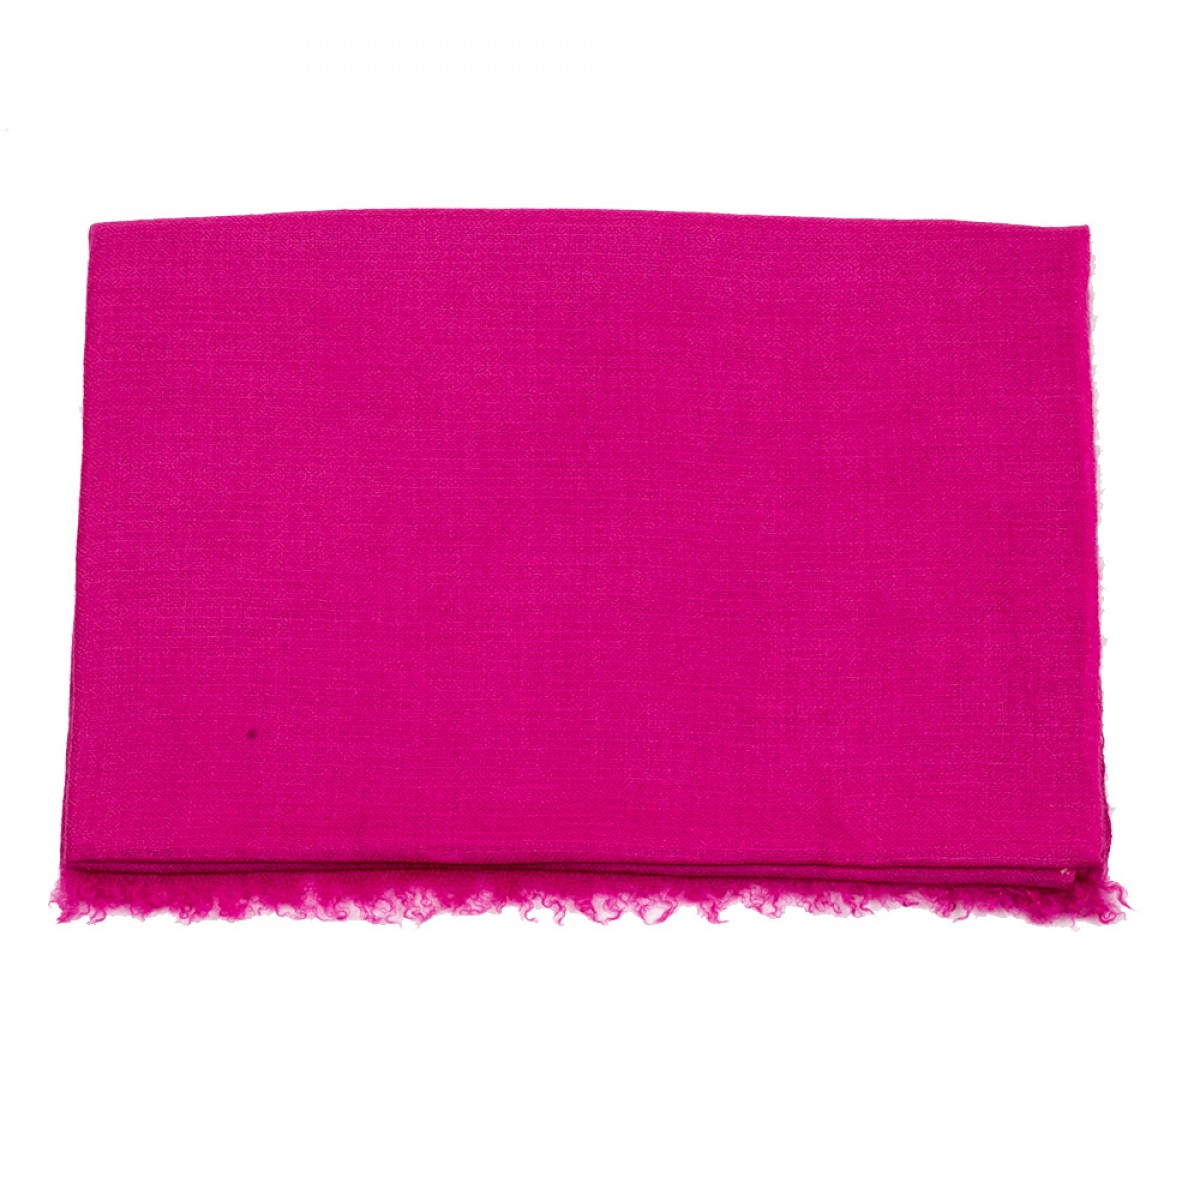 Plain Pashmina Stole - Cerise Pink